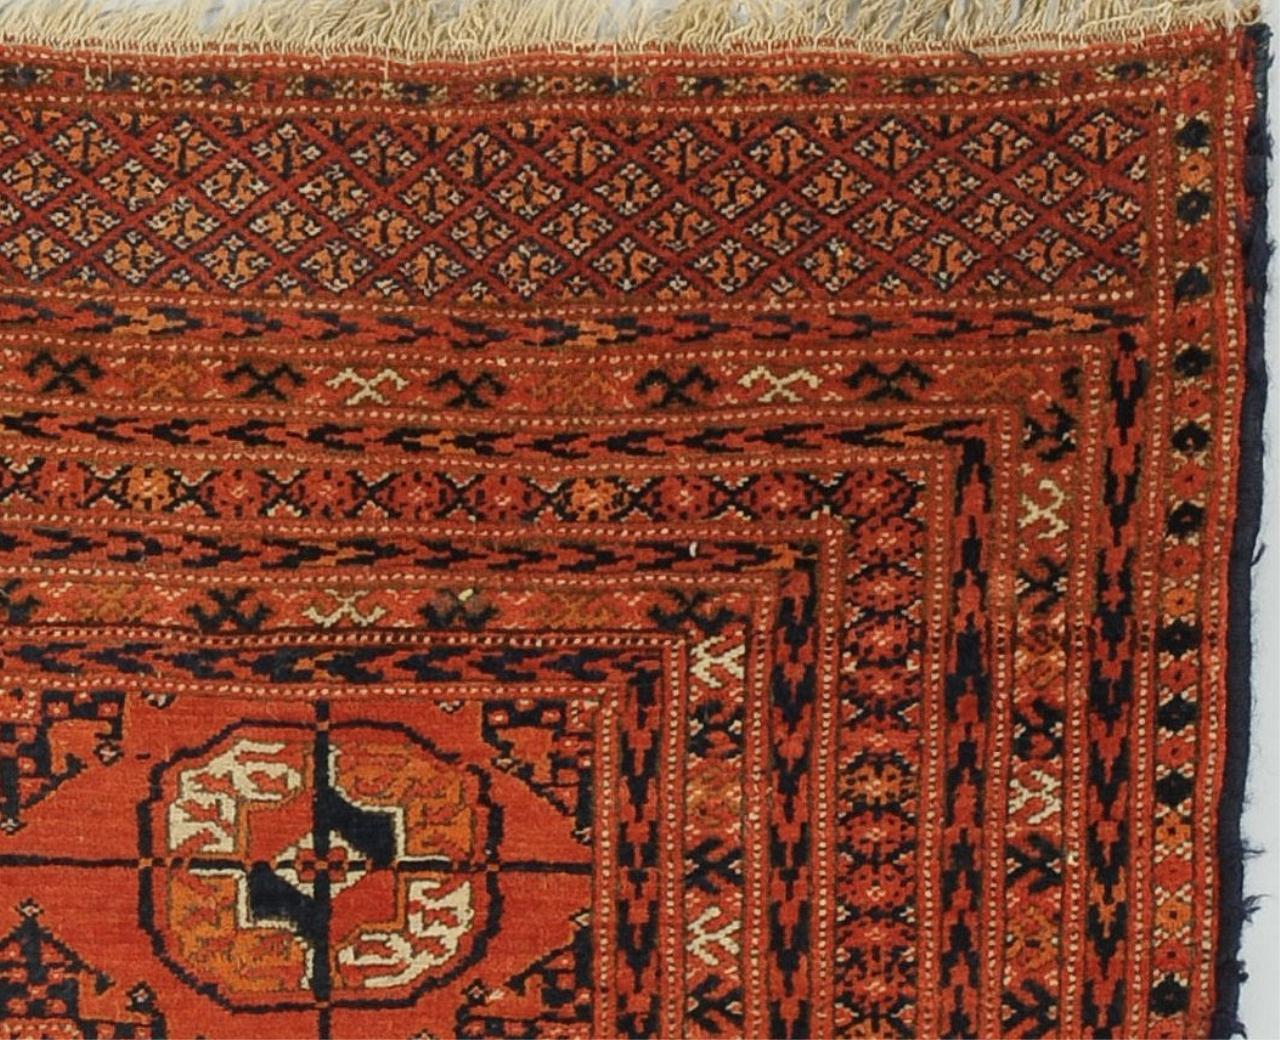 antique tekke bokhara rug - Bokhara Rug